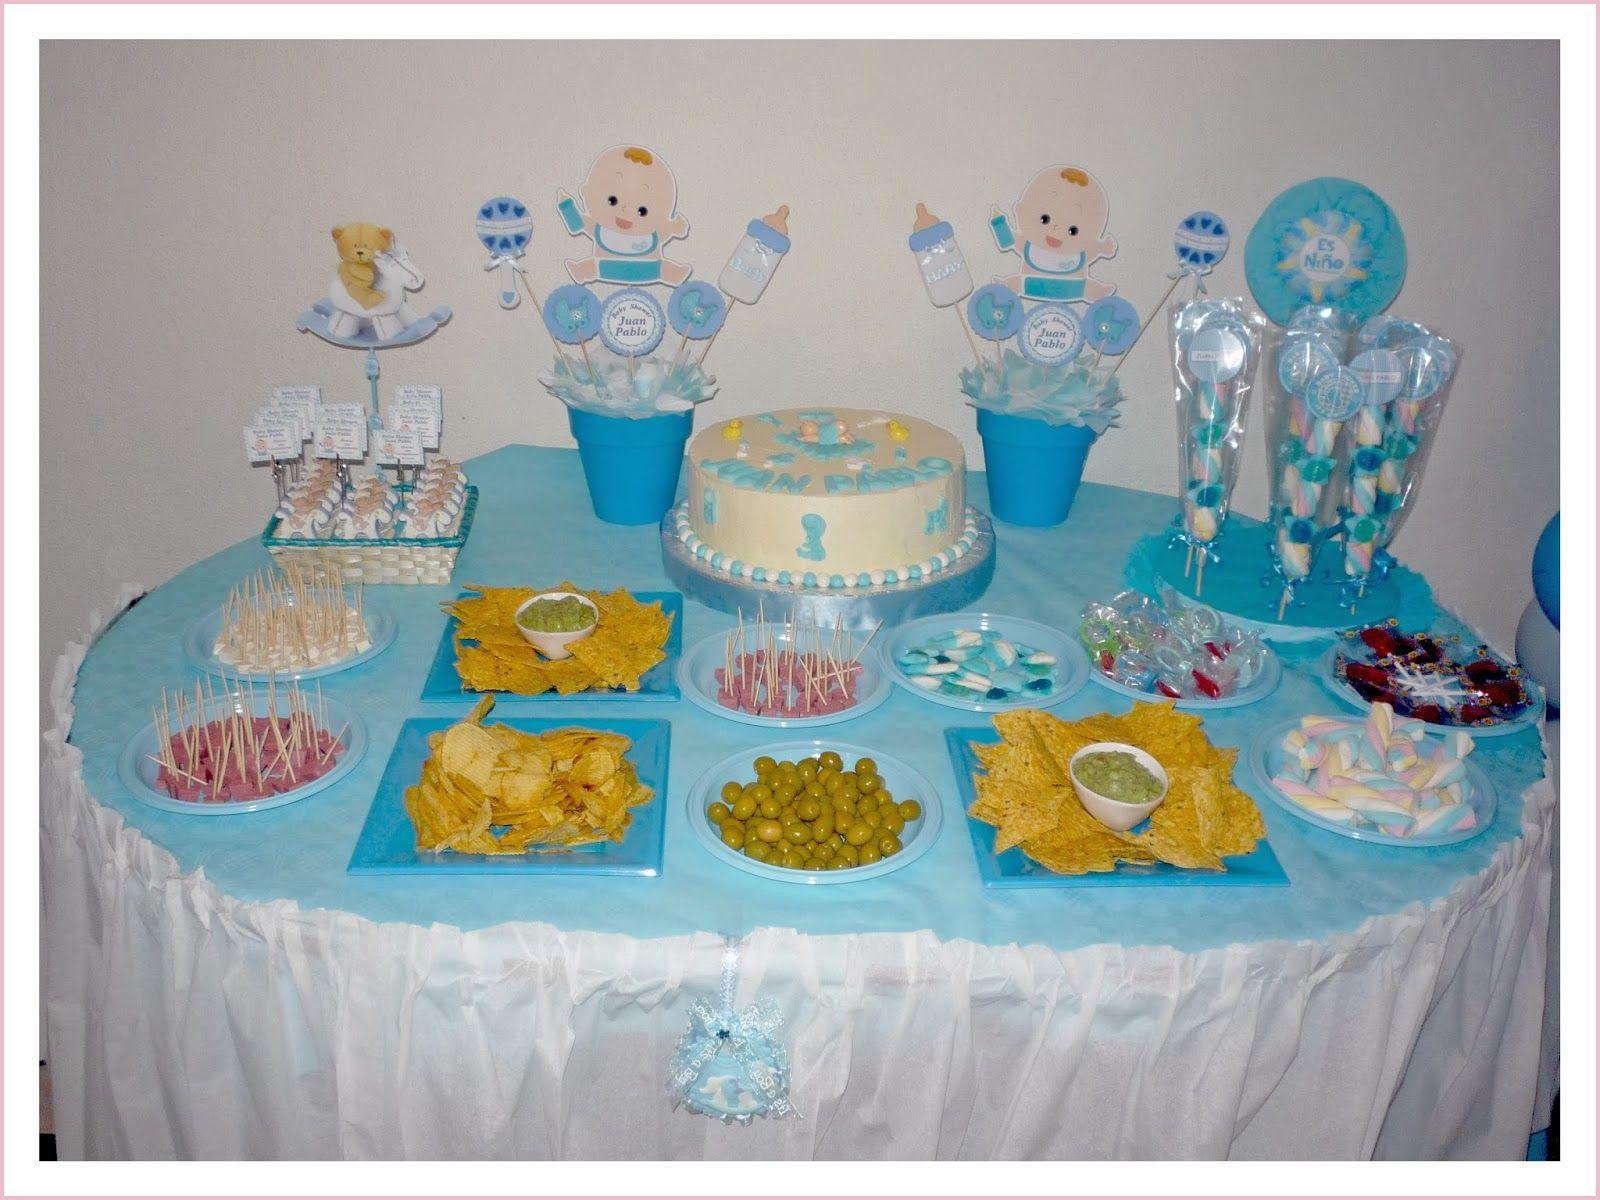 Baby nina fiestas baby shower para juan pablo ideas - Aperitivos para baby shower ...